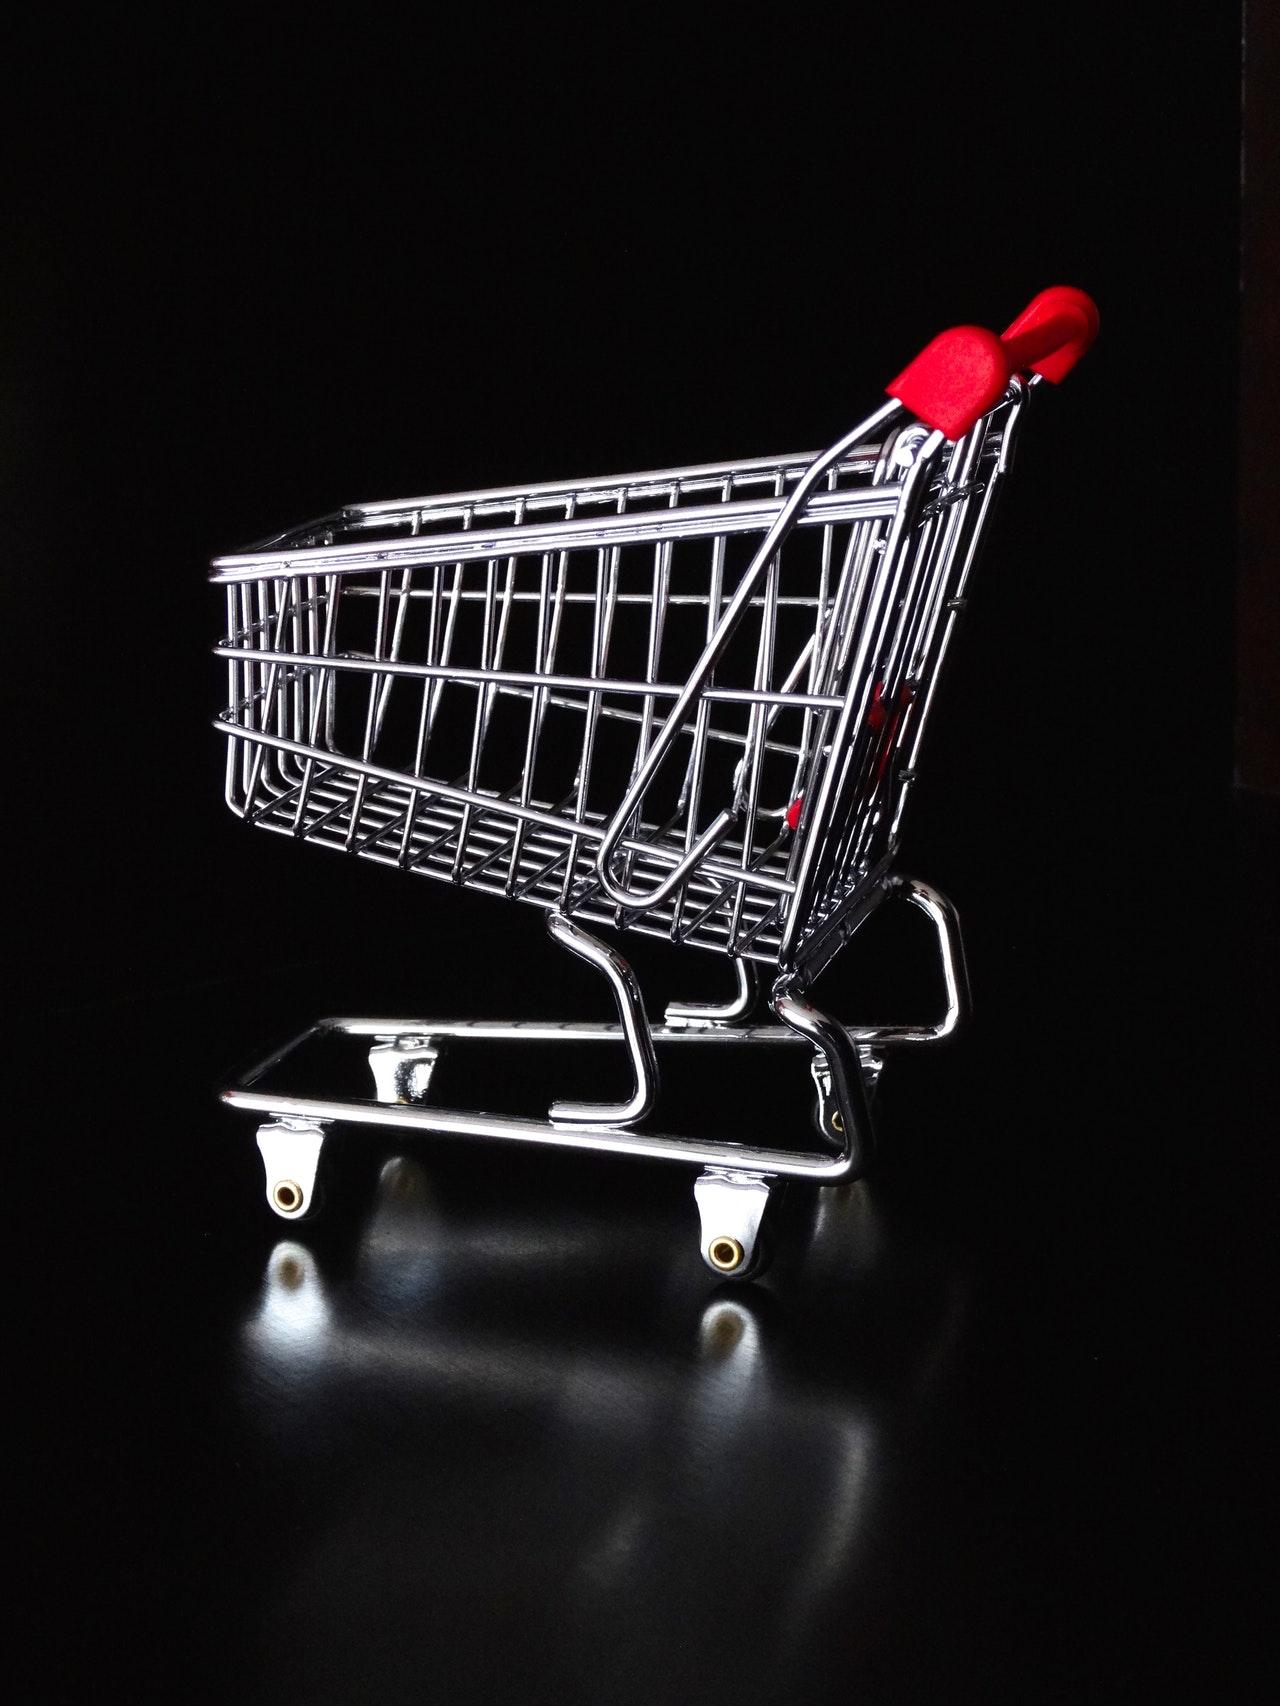 Blind dropship: Empty cart.